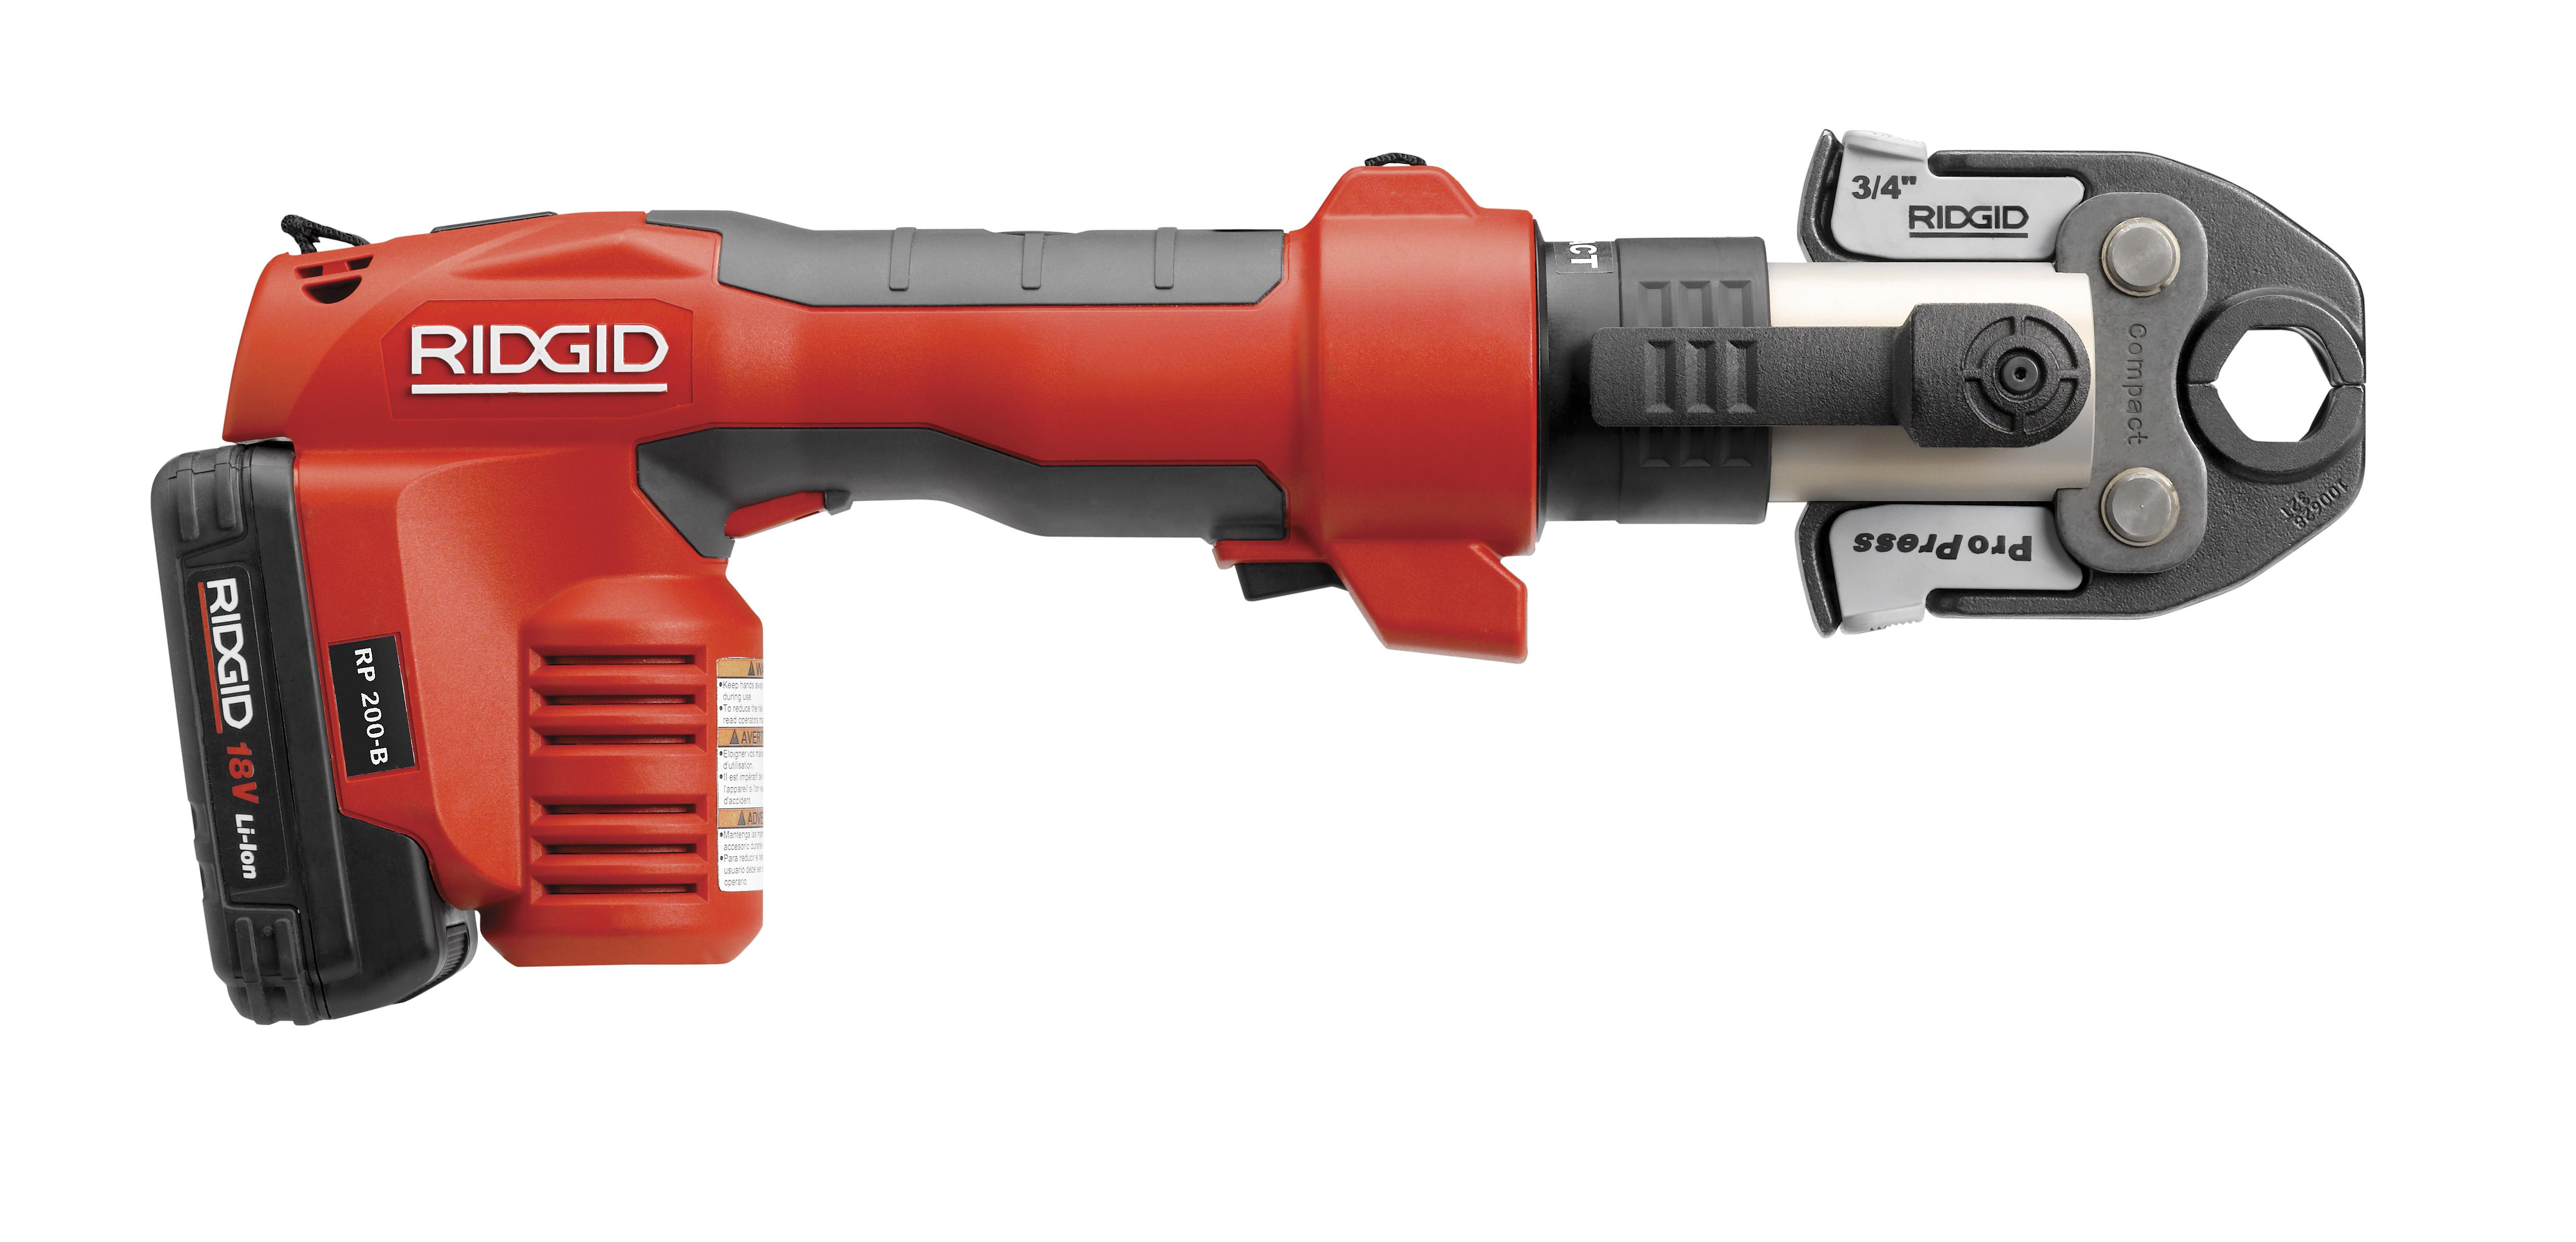 Ridgid 43443 RP 200 Battery Press Tool Kit (No Jaws) - Sku 43443